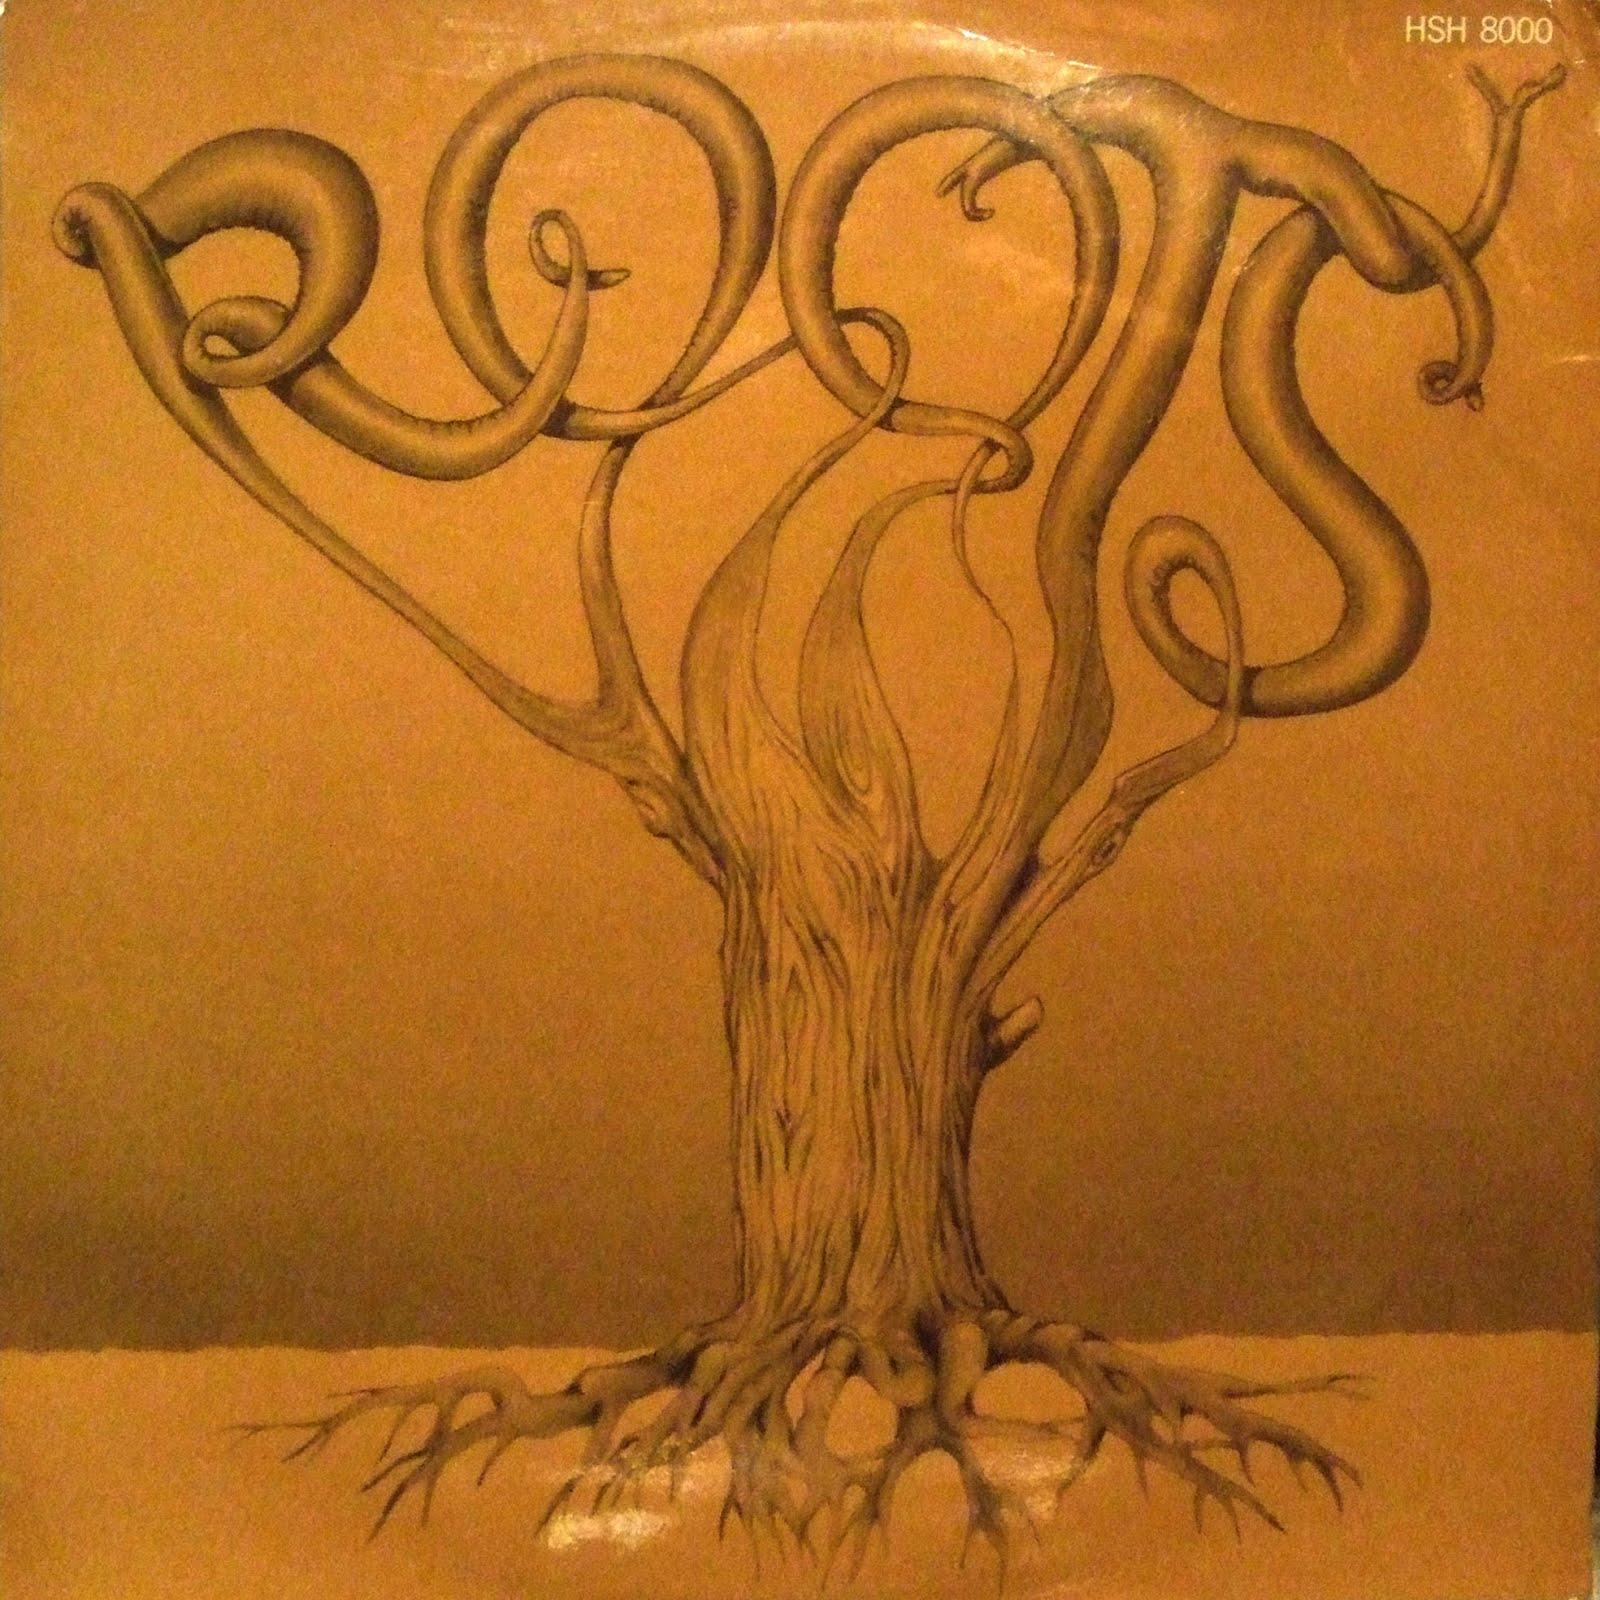 http://1.bp.blogspot.com/-rmIeiH8k0KM/T0fEThZhfiI/AAAAAAAAArk/mGGr3uKT20Q/s1600/Rootsa_web.jpg